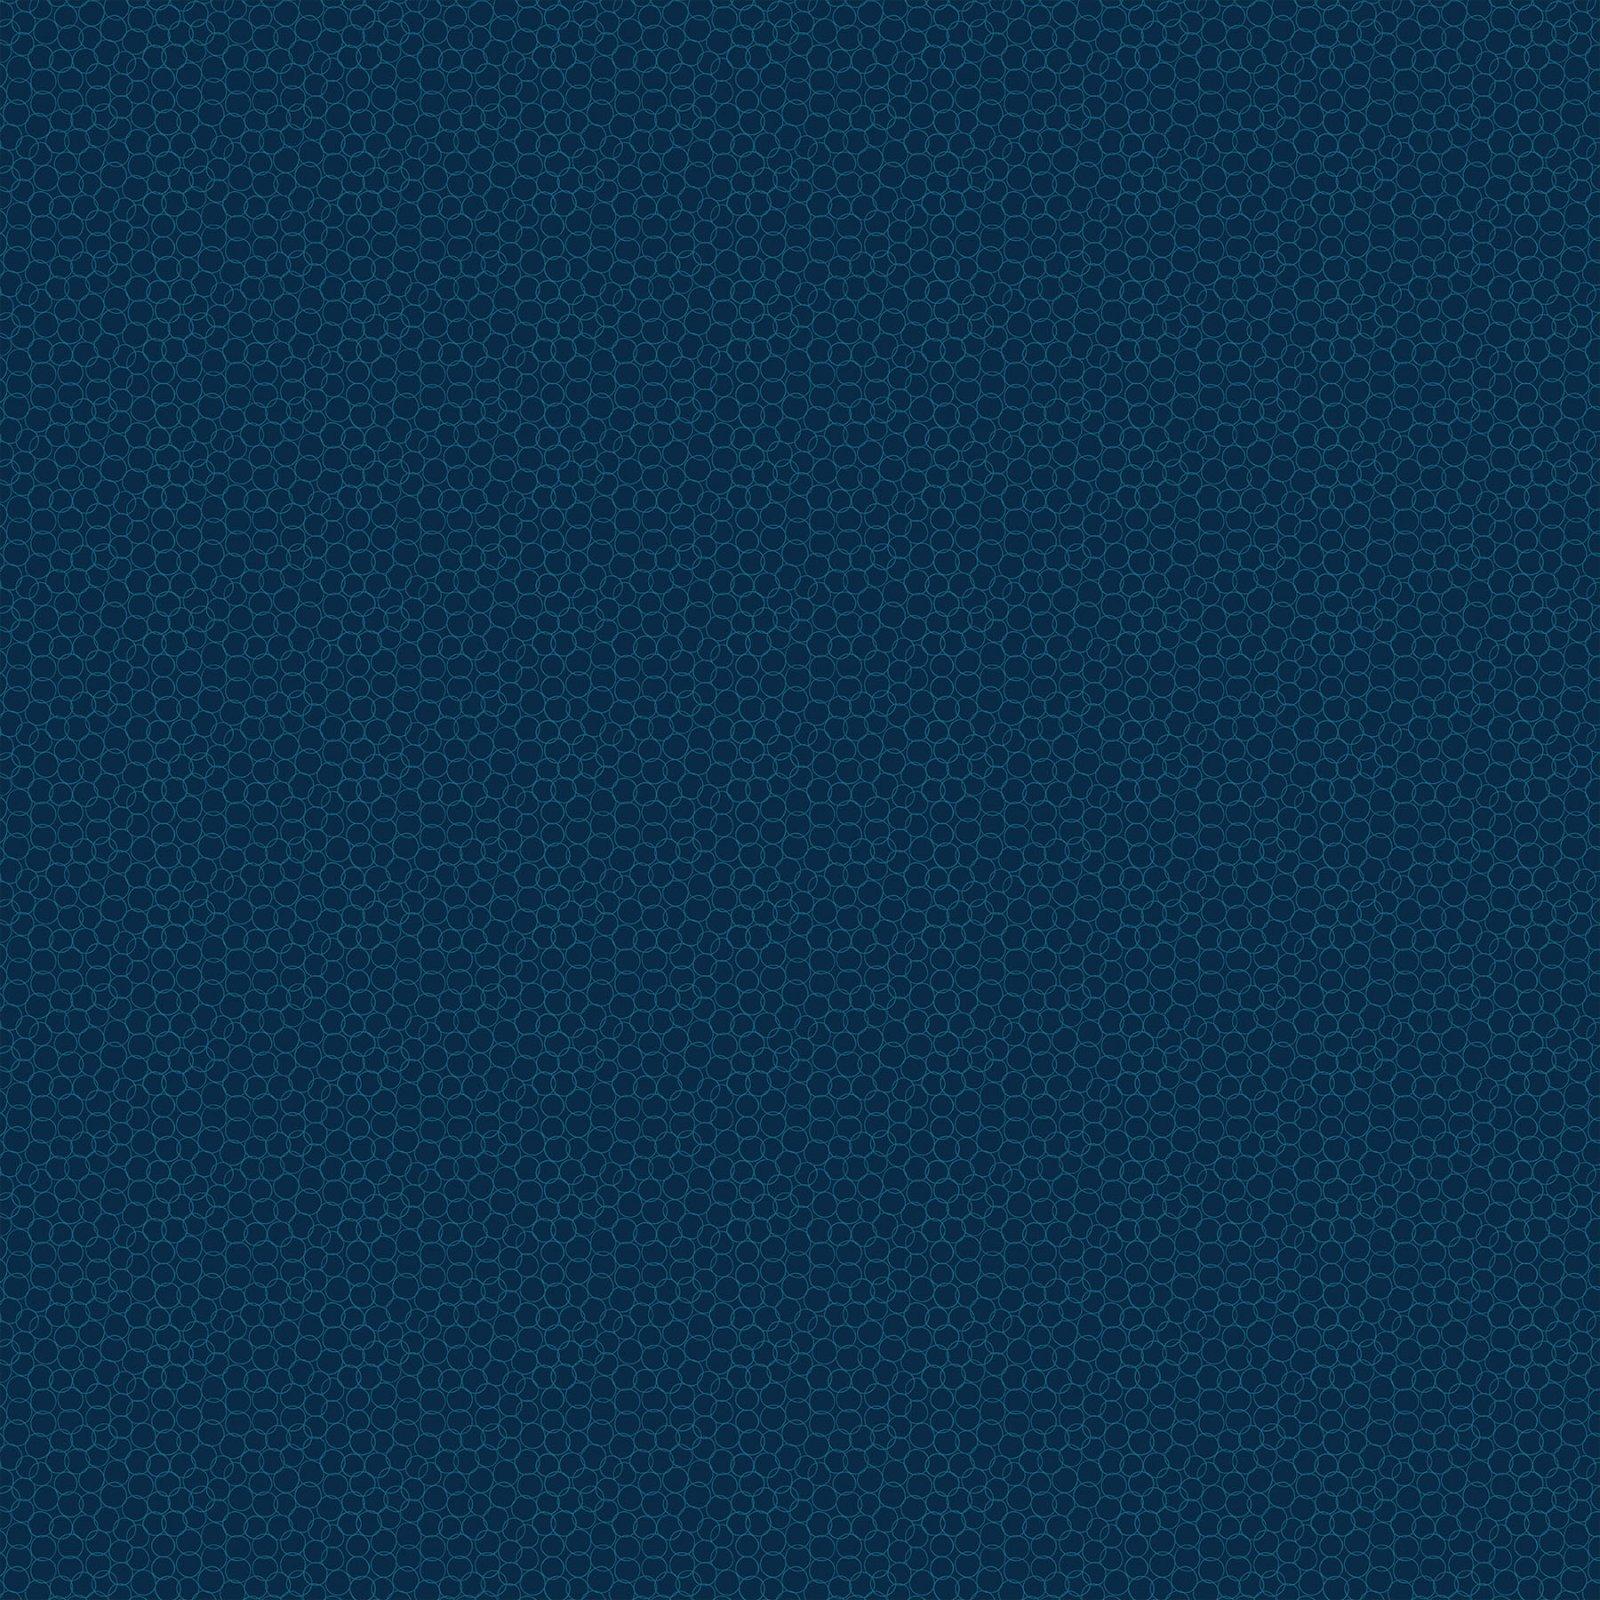 Grow by Pippa Shaw for Figo Fabrics - Bubbles - Navy